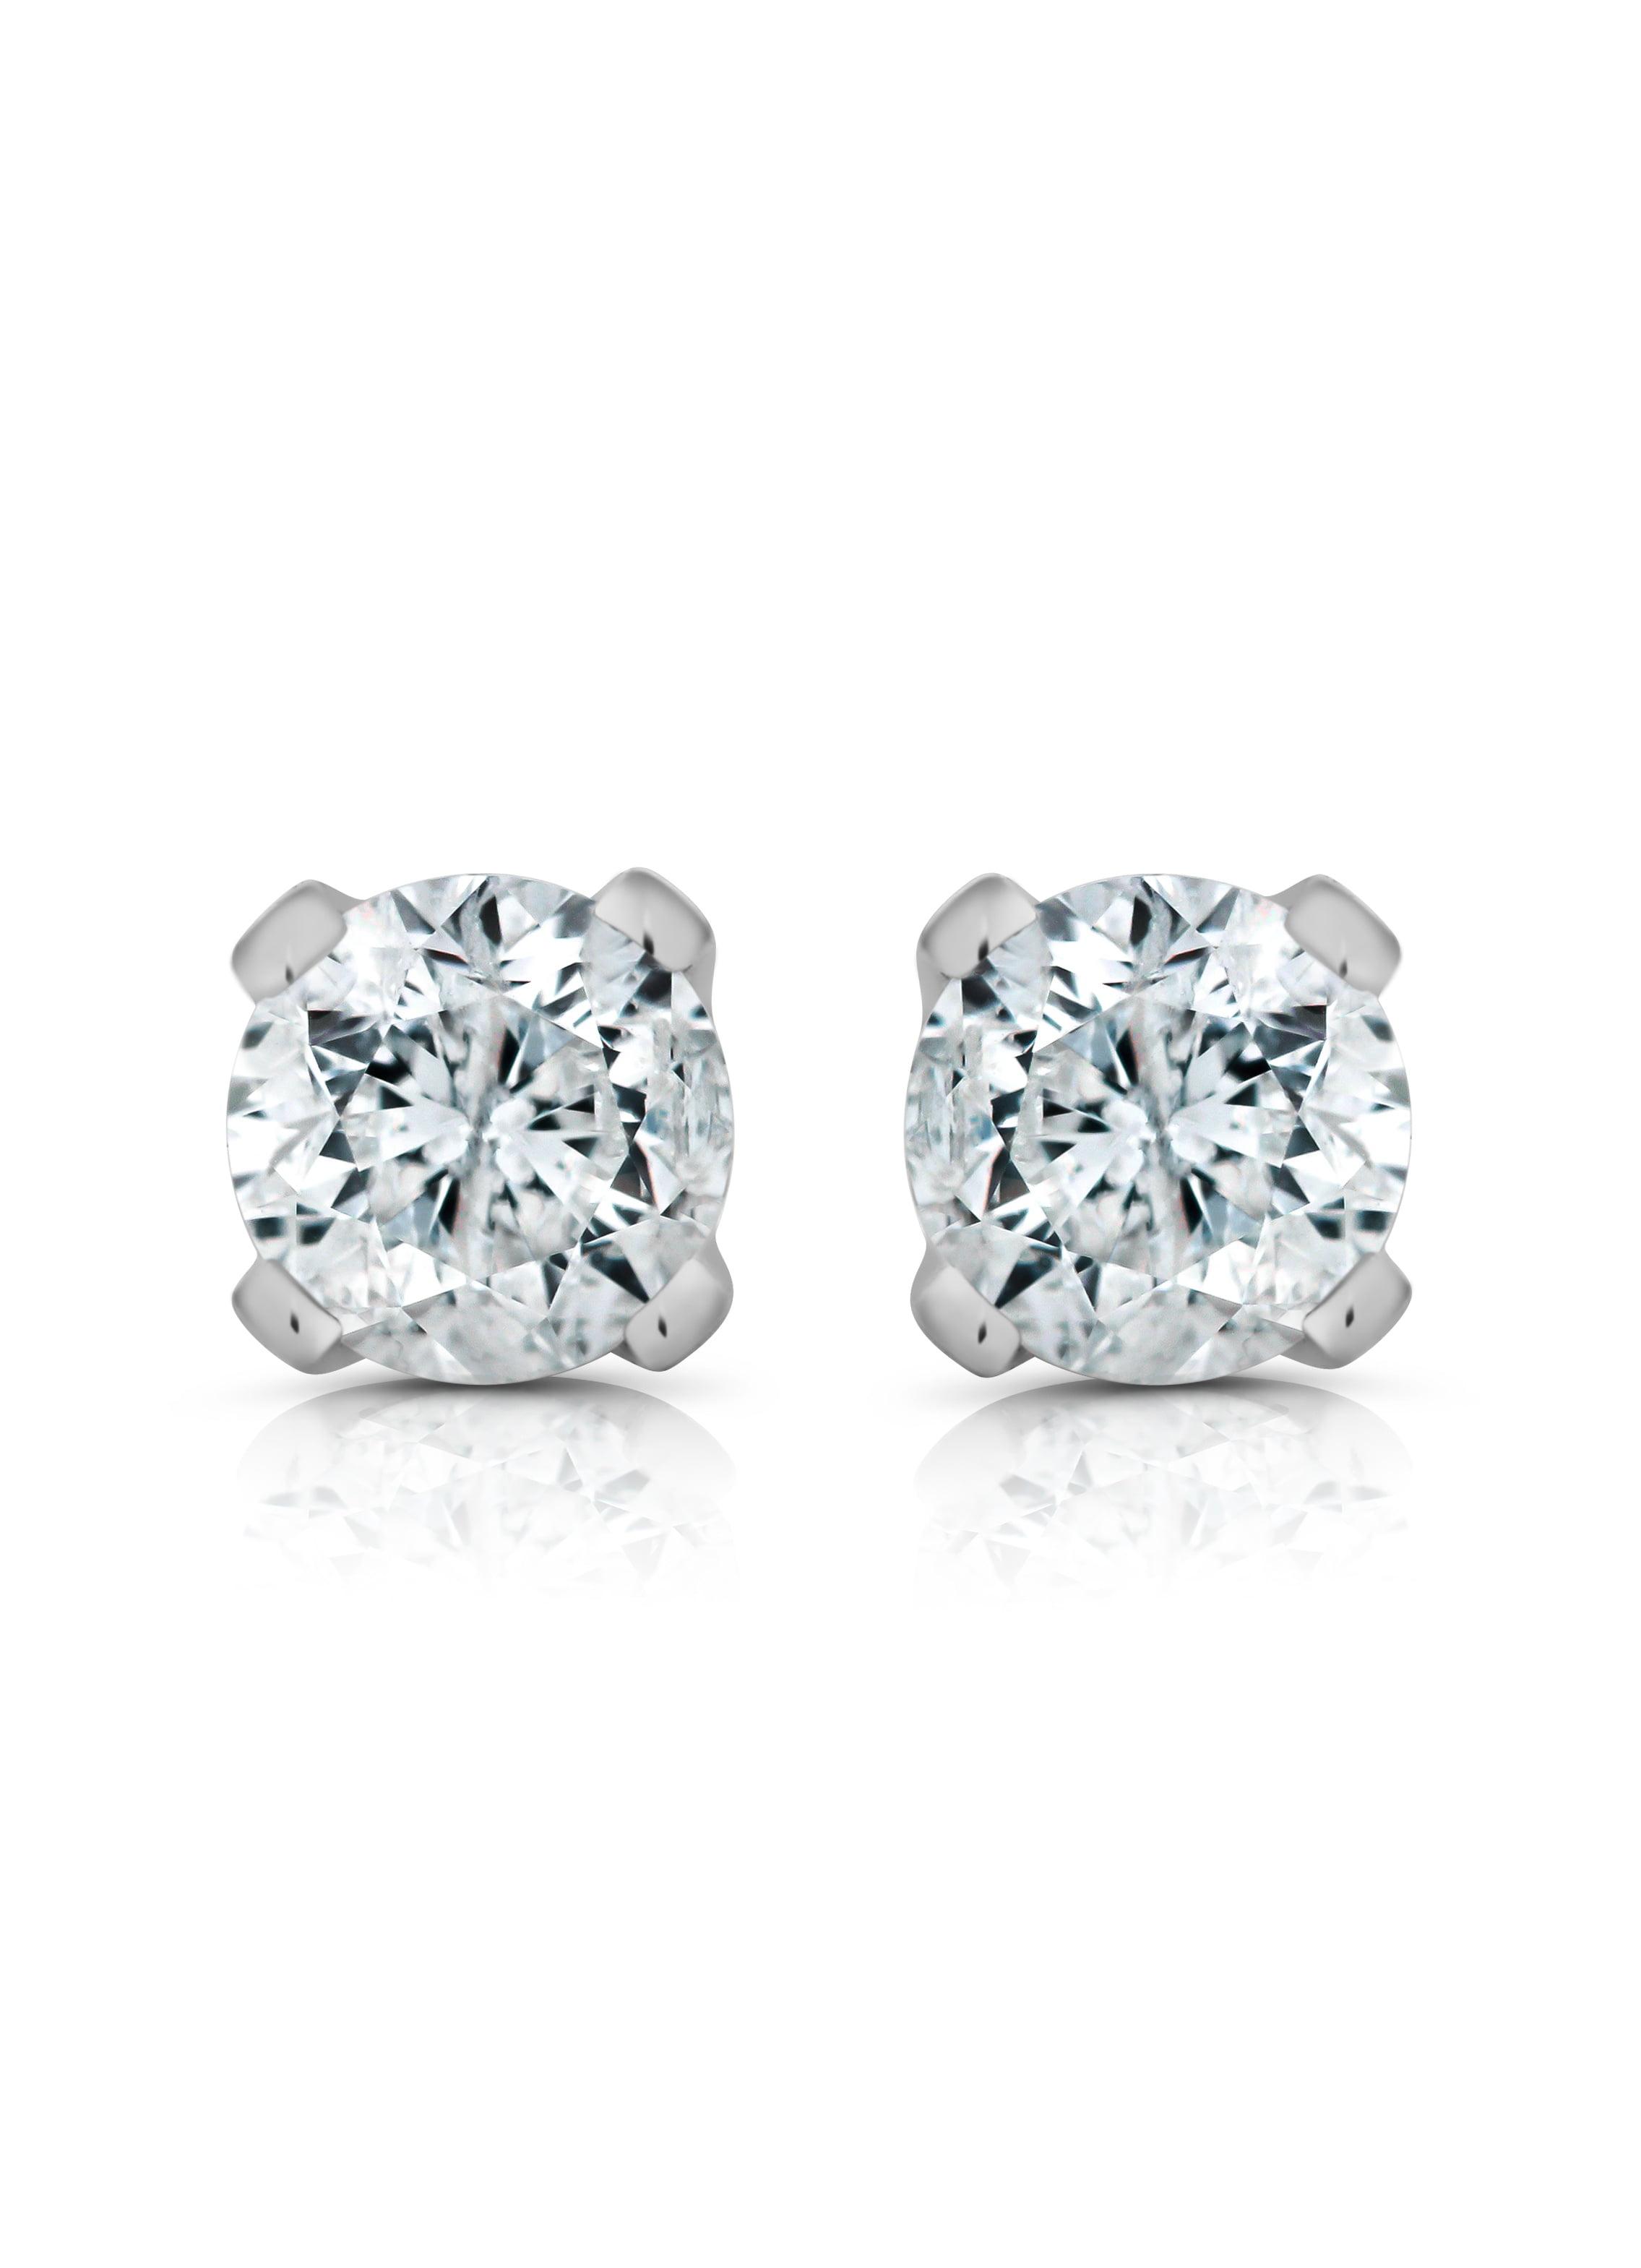 IGI Certified 1/3 Cttw 14K Solid White Gold Diamond Stud Earrings